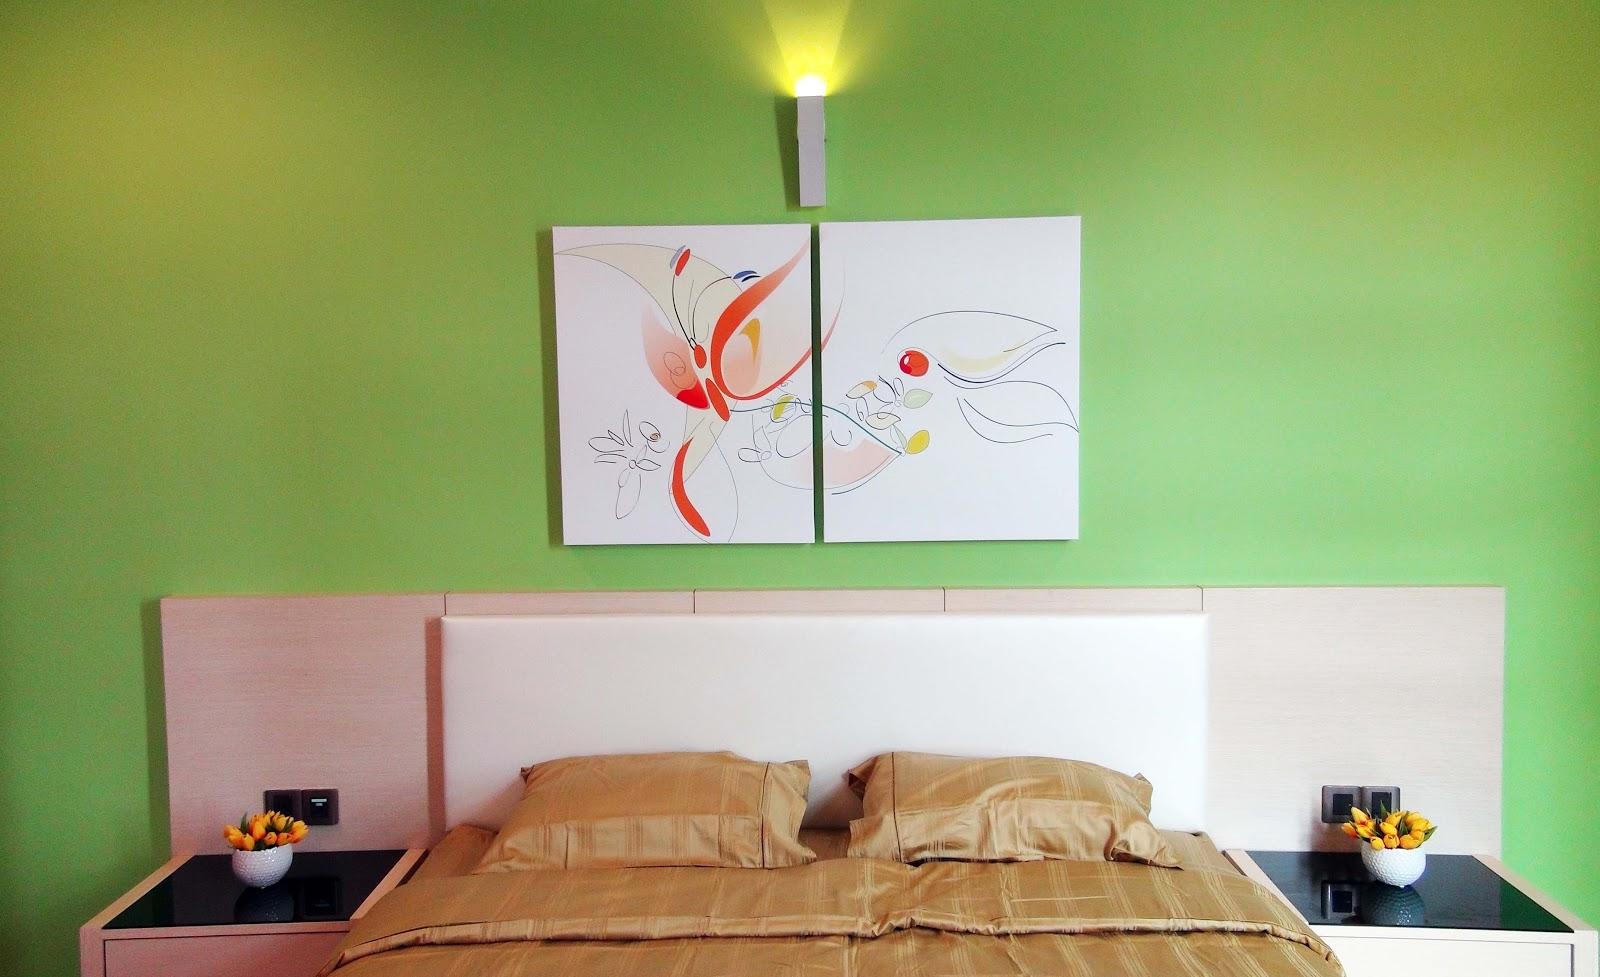 Artbug Buzzing The Brezza Condominium Tanjung Tokong Penang